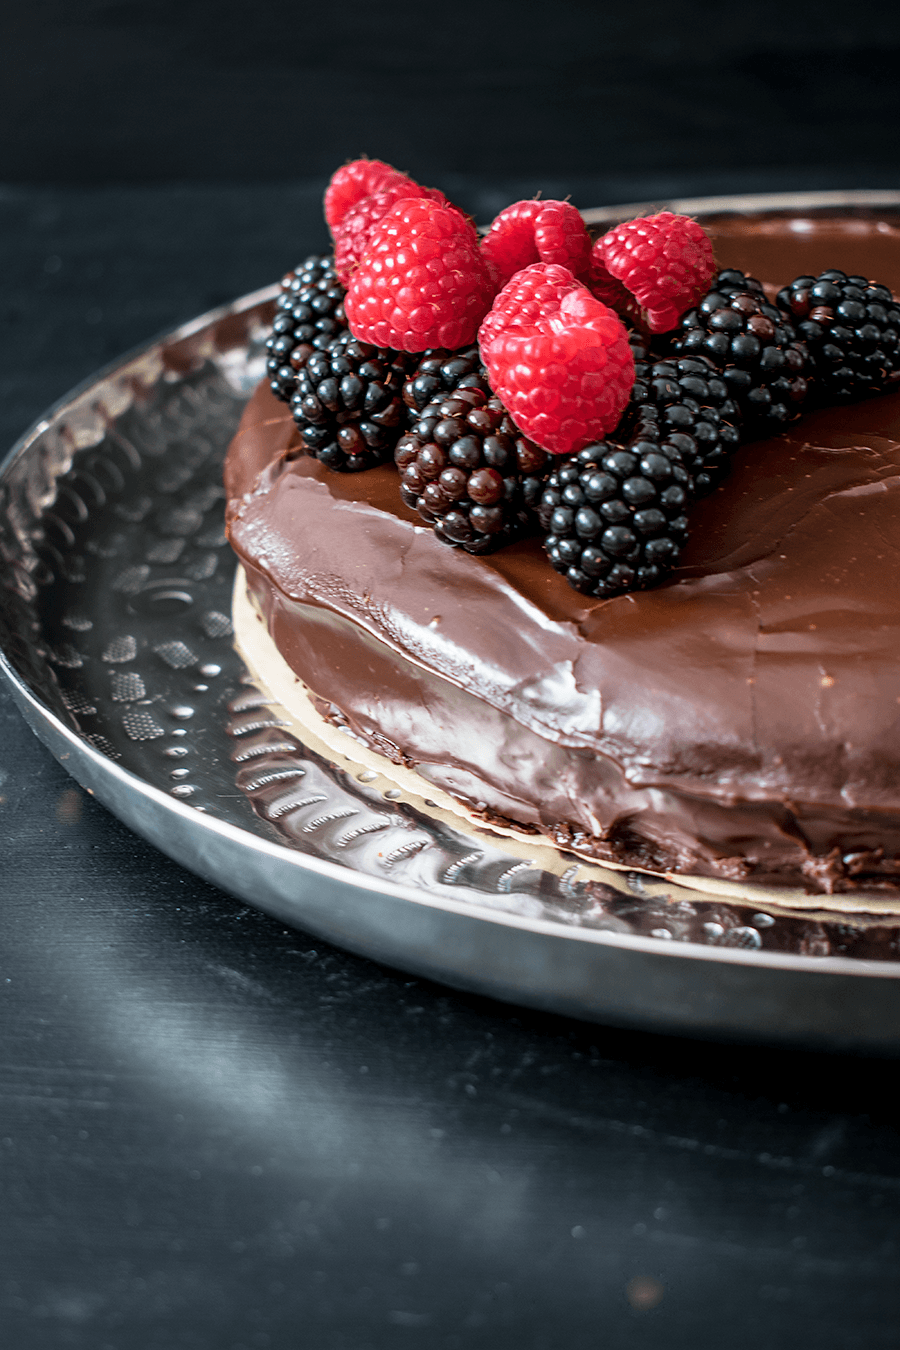 Süß-fruchtiger Schokoladentraum